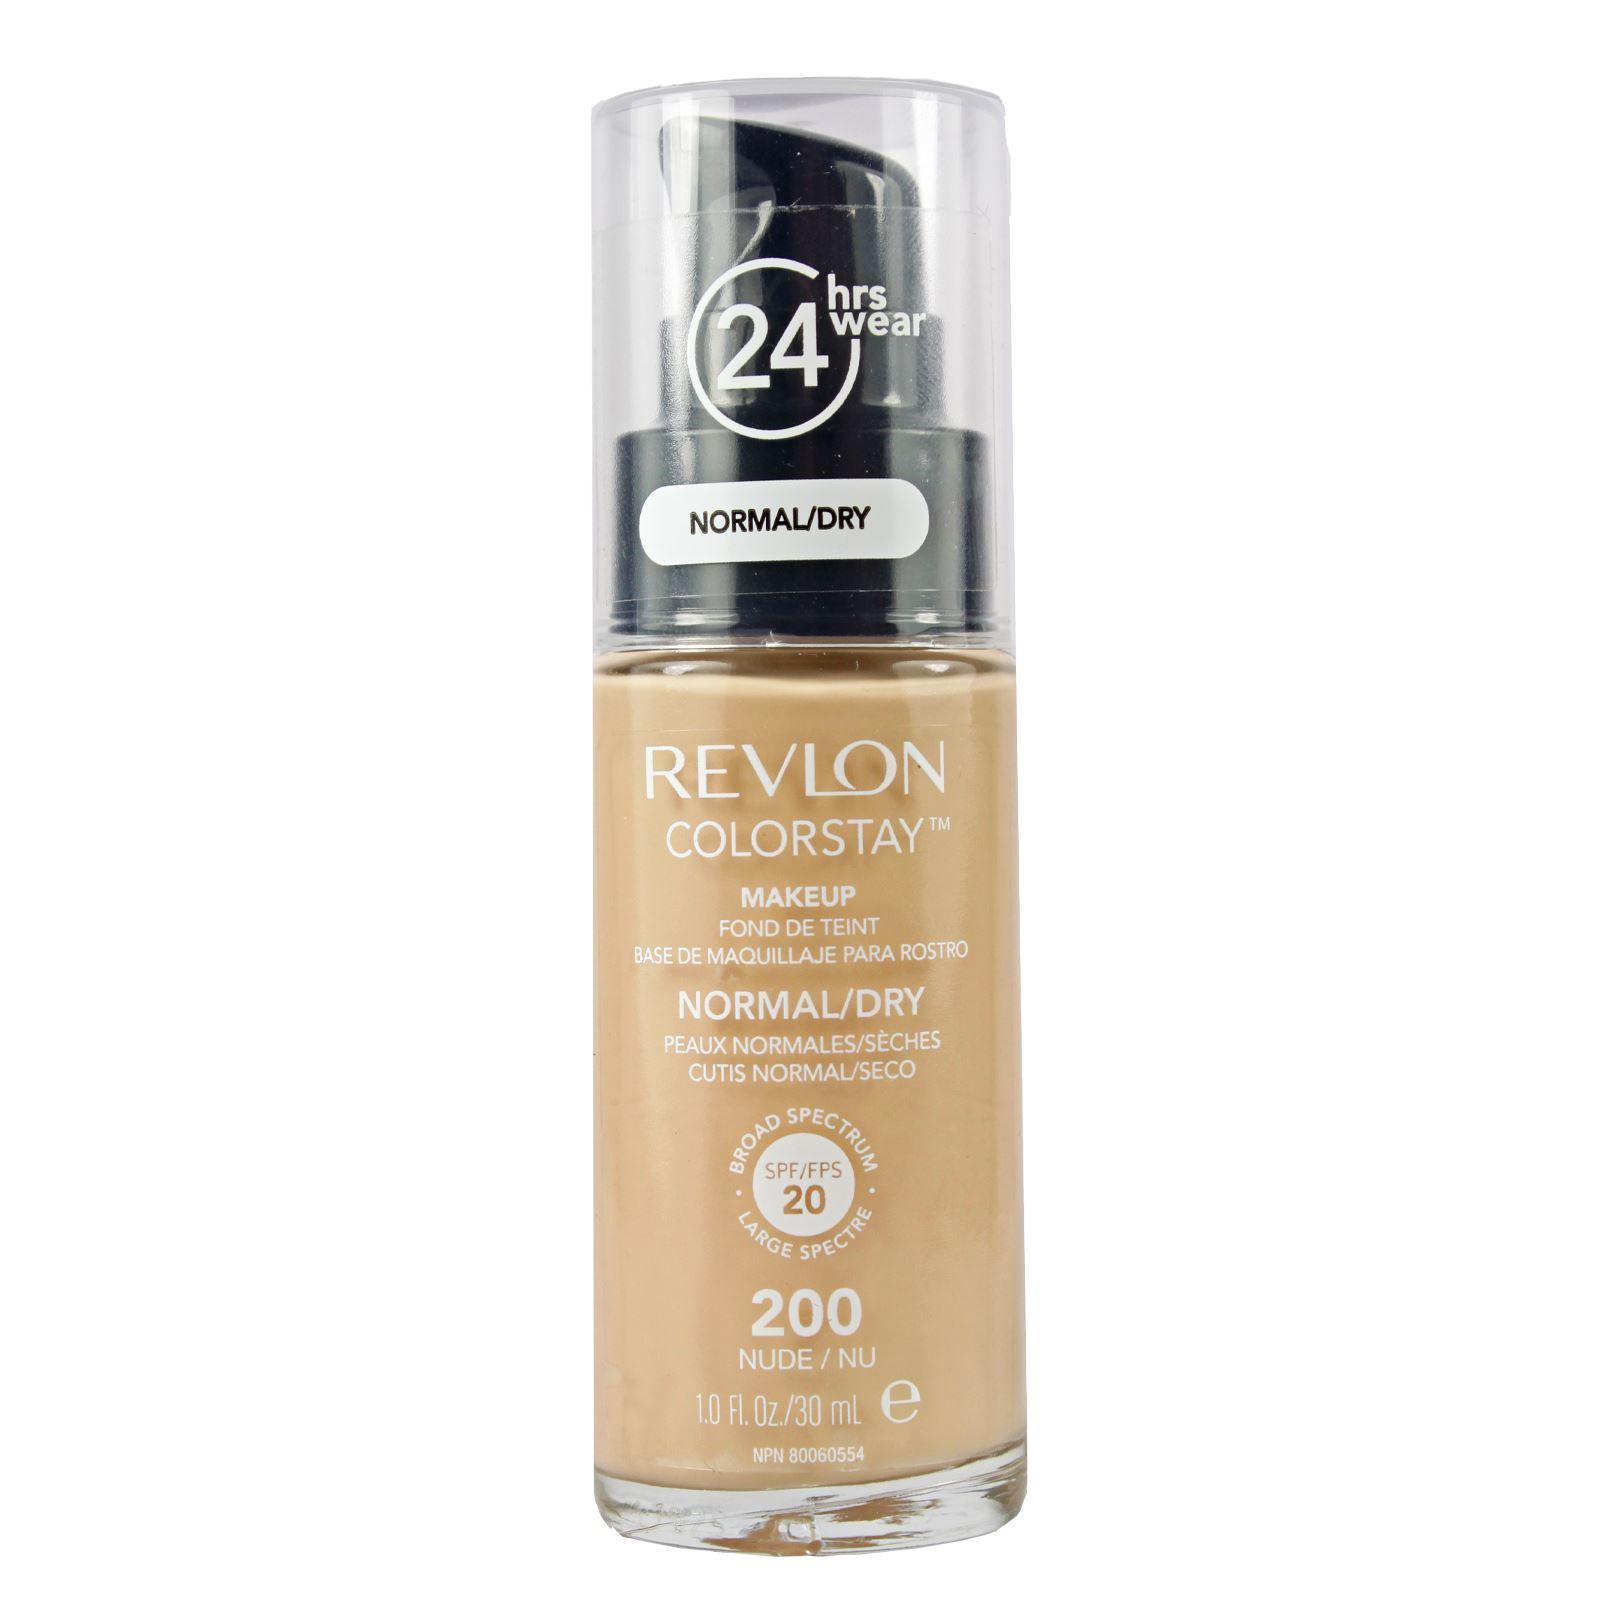 Revlon-COLORSTAY-Base-de-Cobertura-Completa-24hrs-desgaste-SPF-Maquillaje-Mate-Sin-Aceite